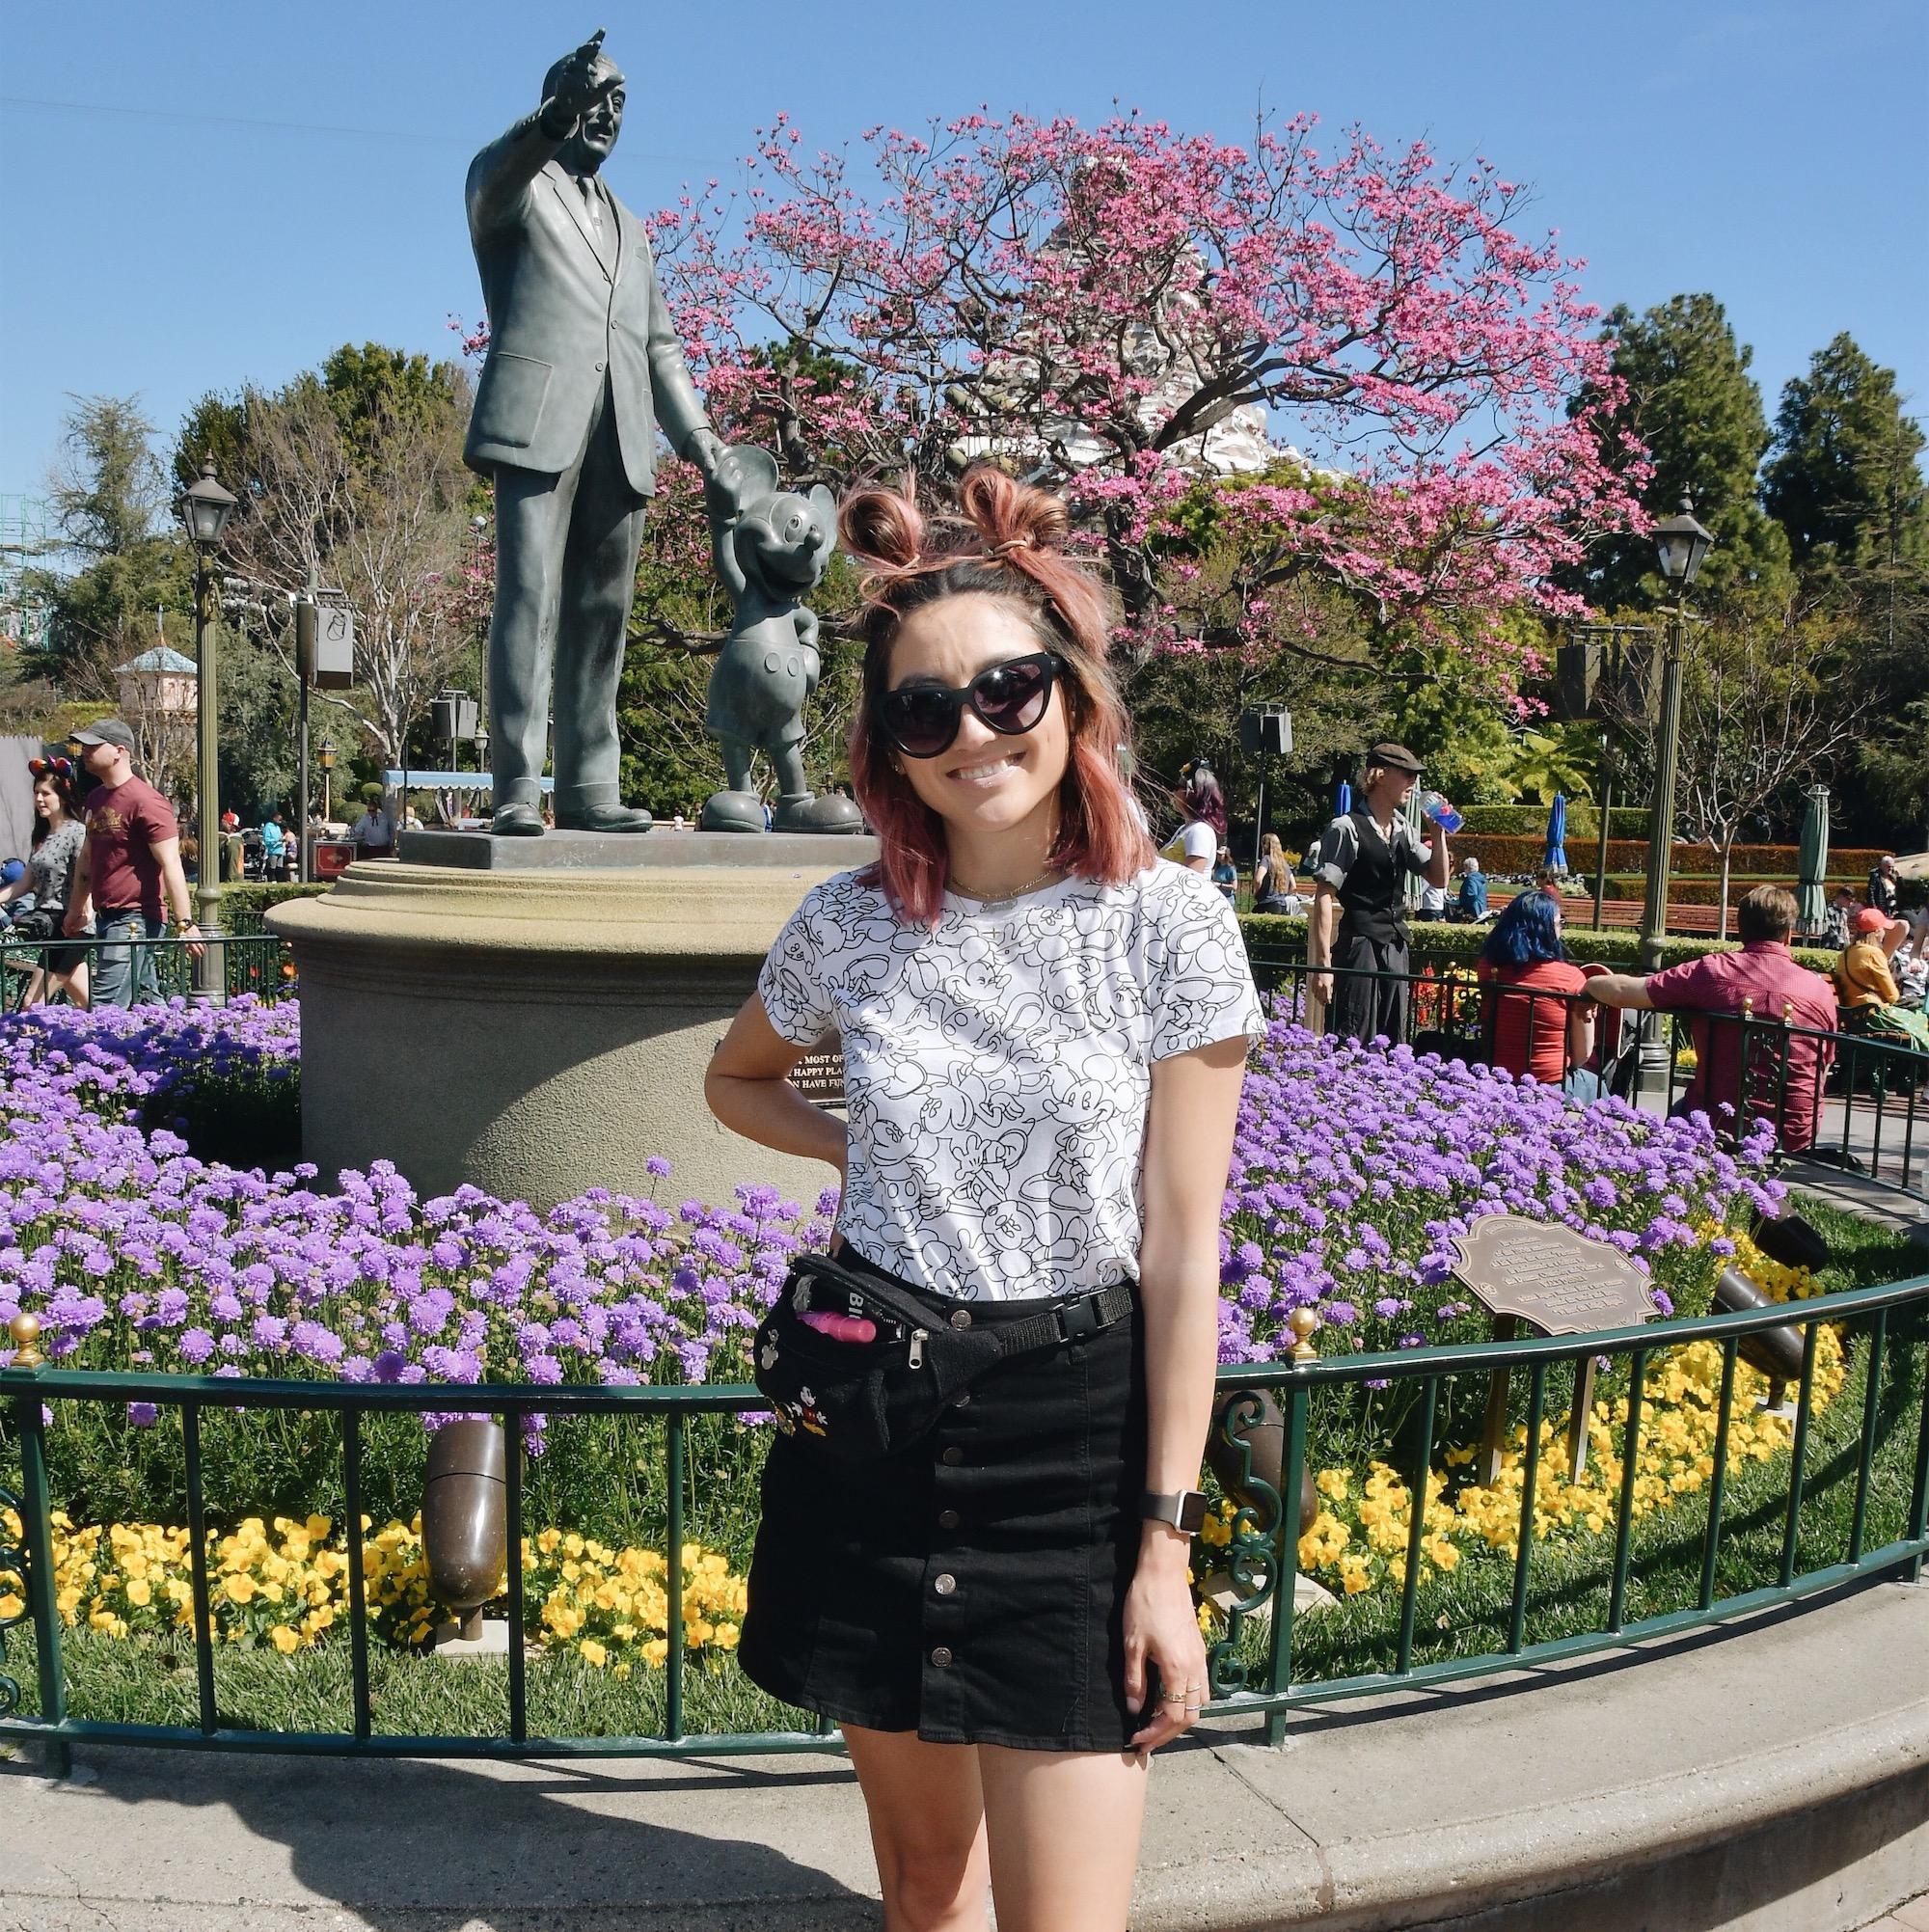 Day 5 - Disneyland